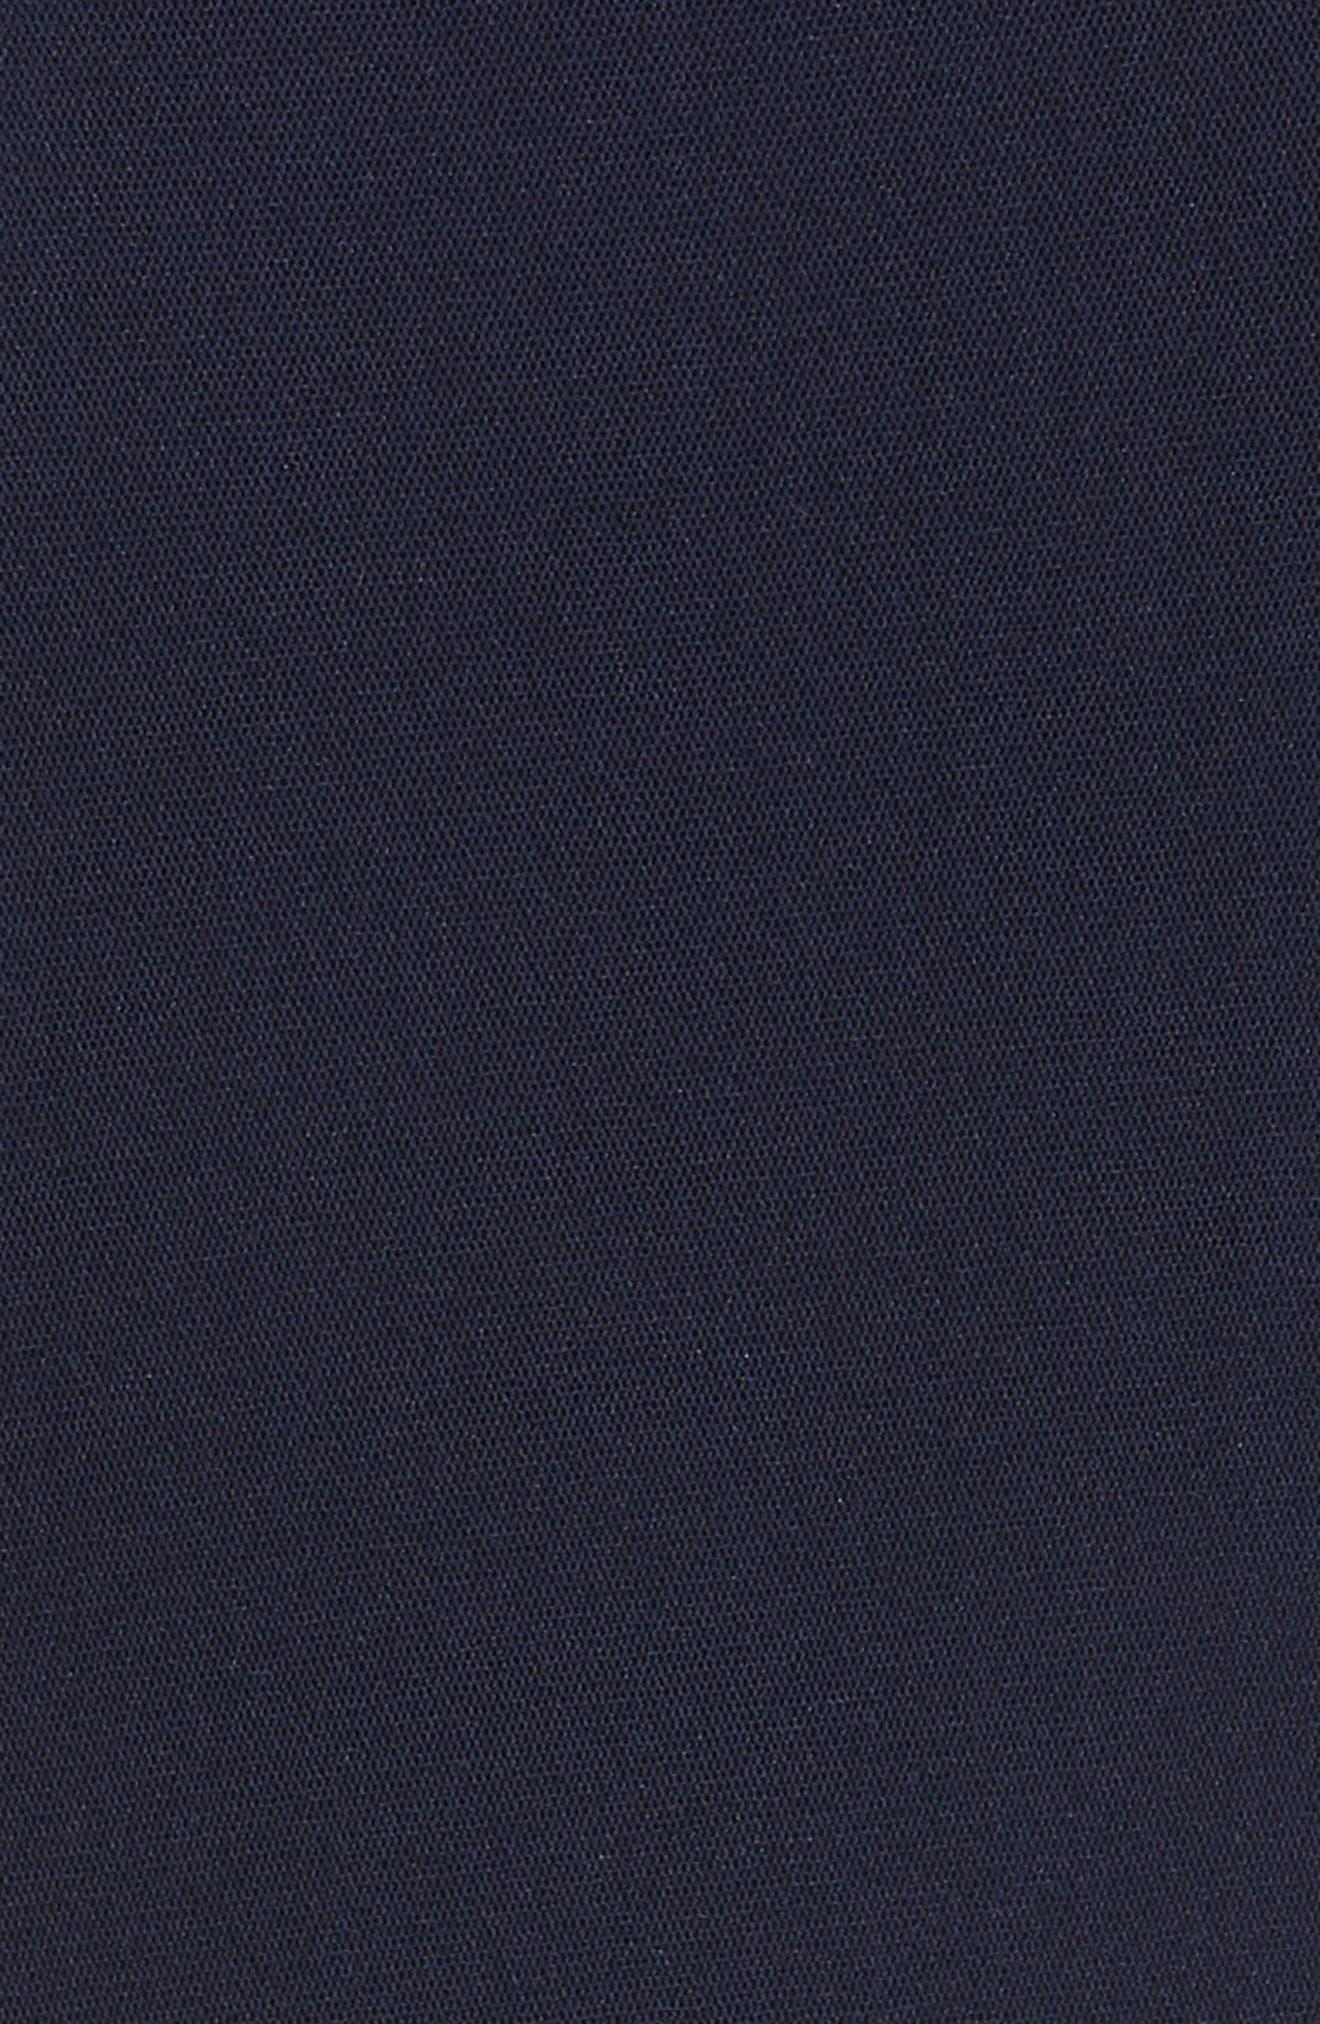 Ruffle V-Neck Body-Con Dress,                             Alternate thumbnail 5, color,                             411